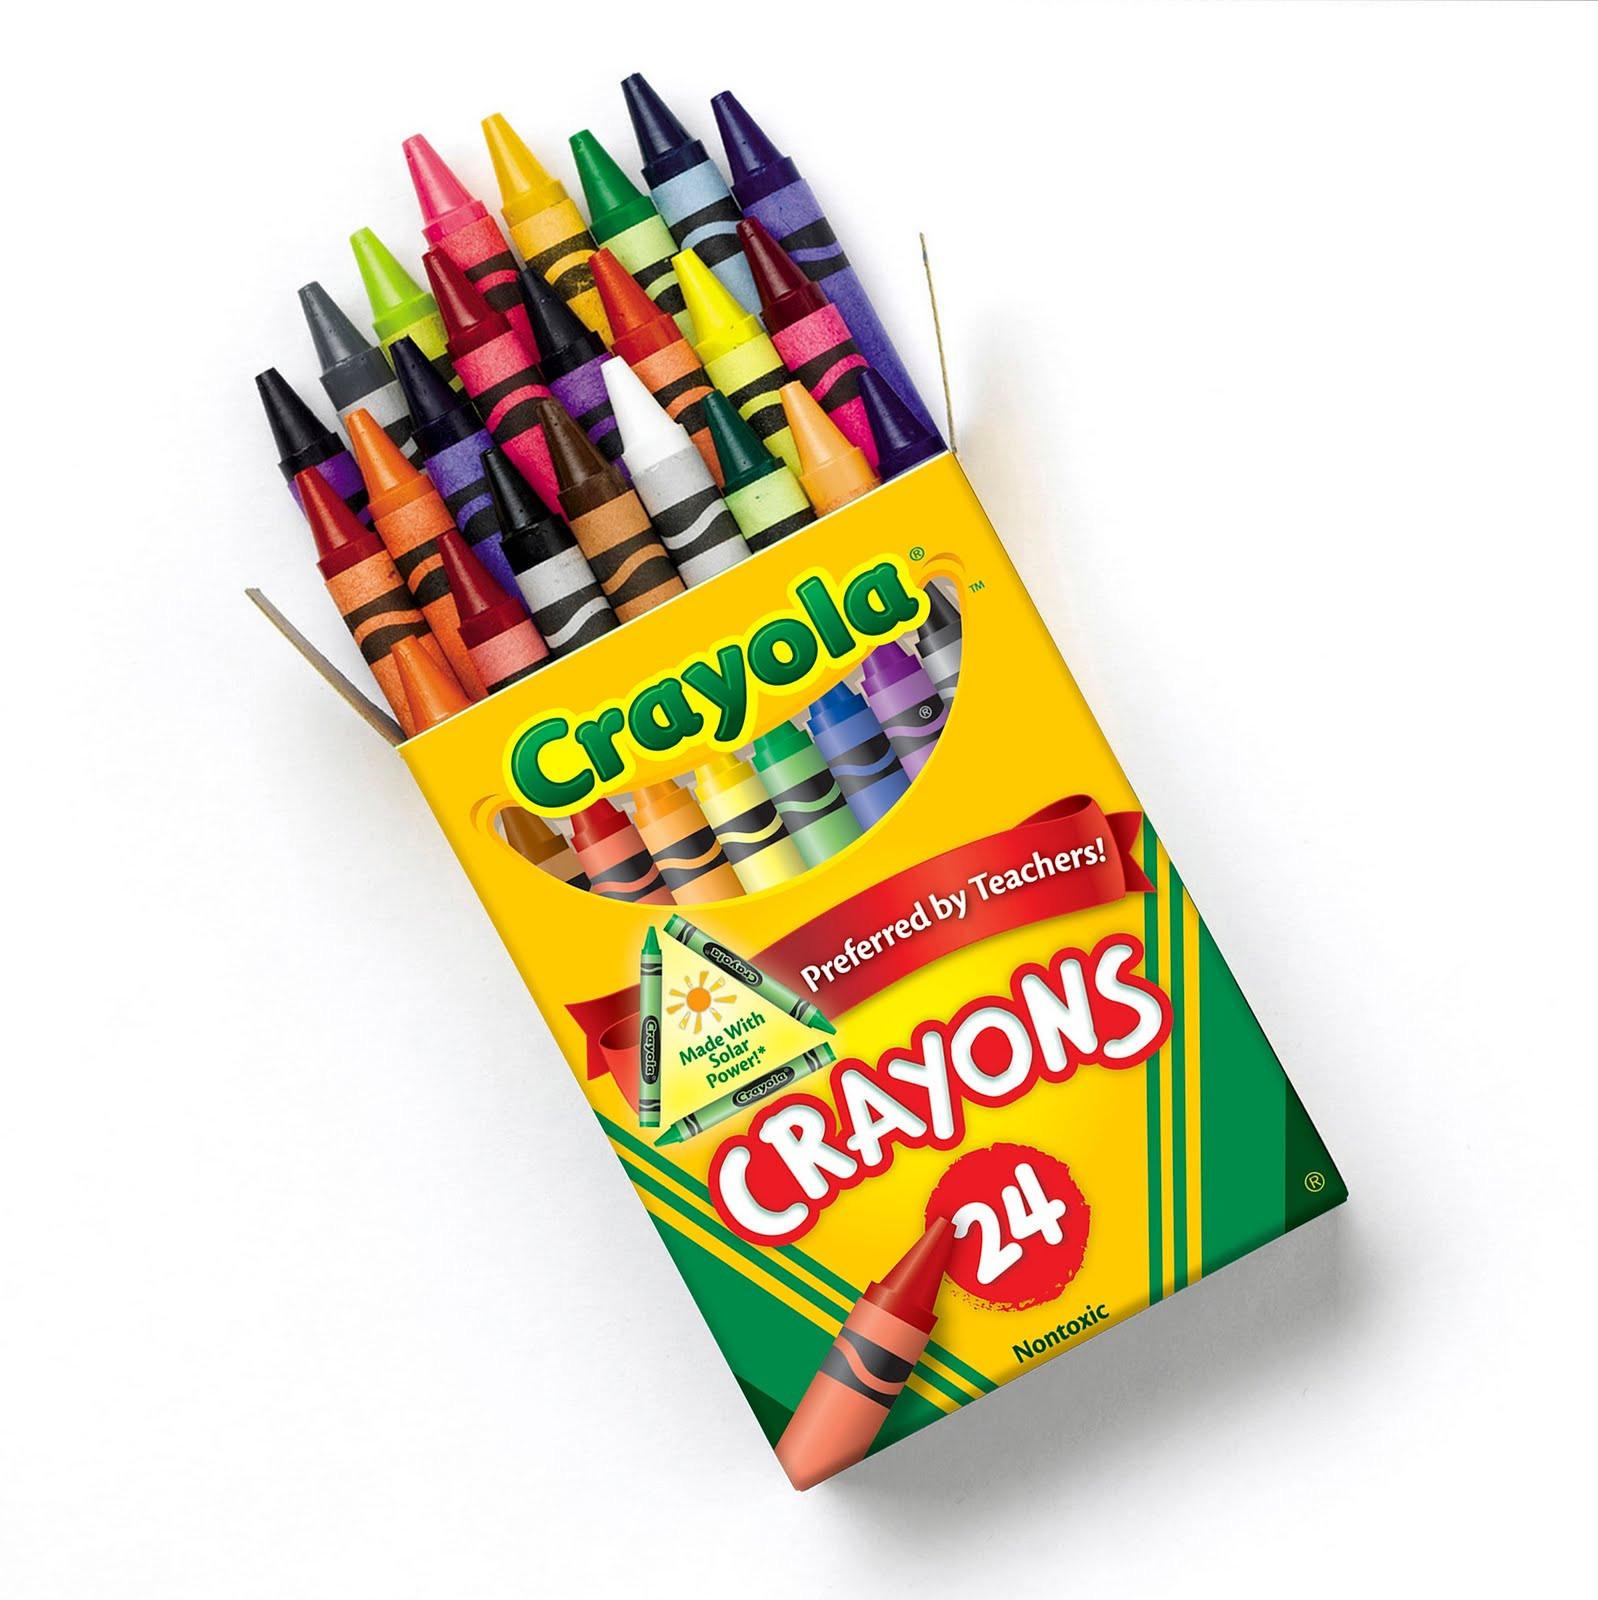 Crayola crayon clipart 1 » Clipart Station.